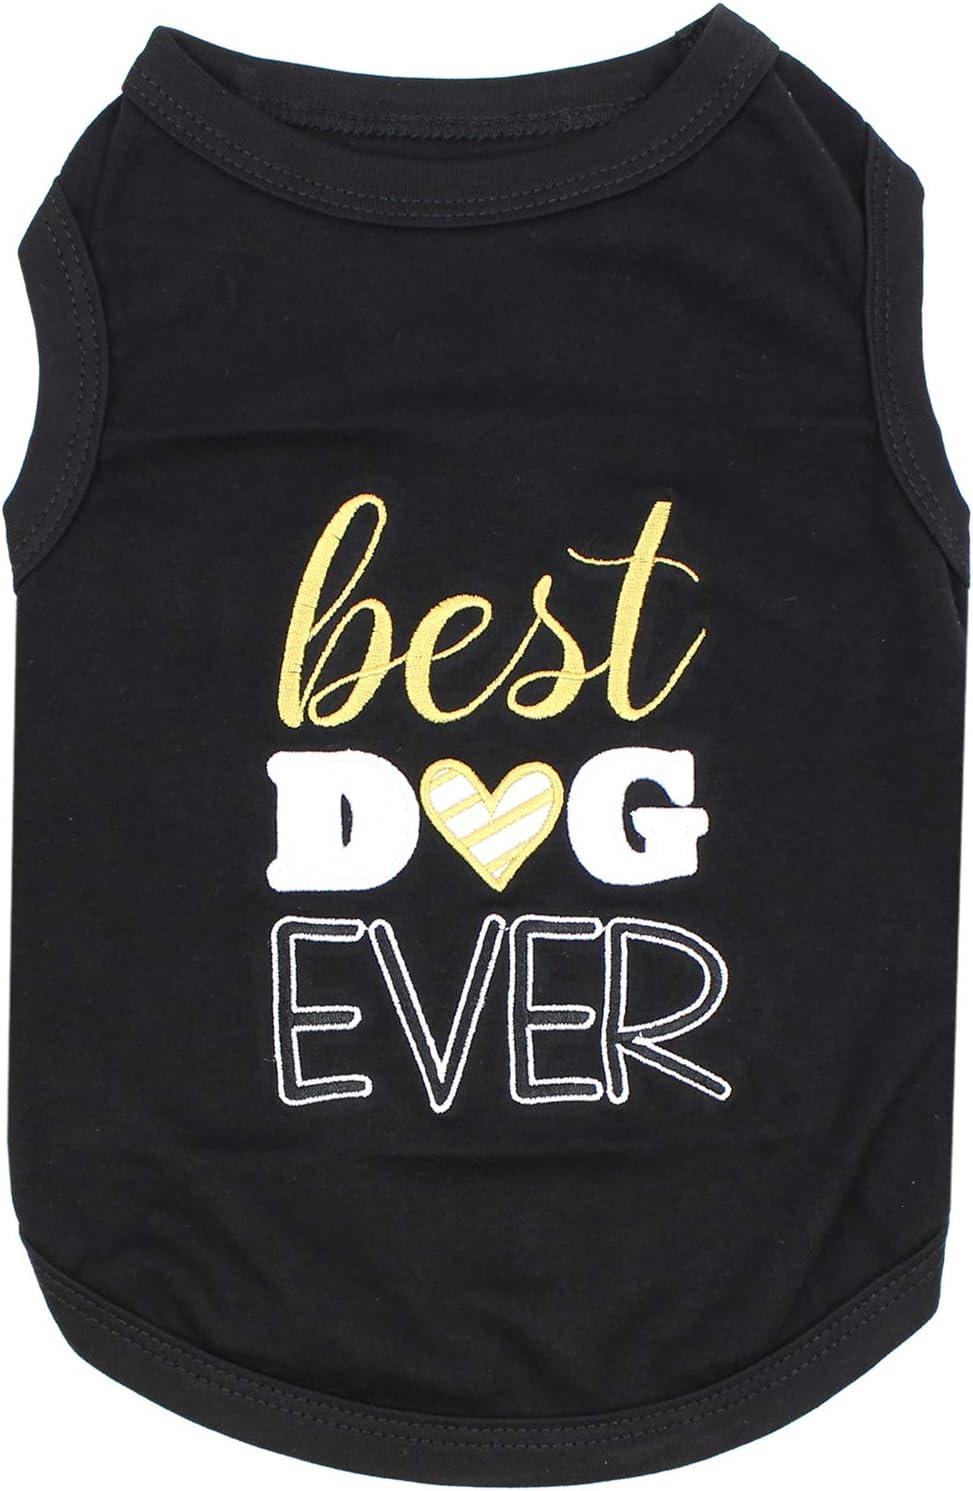 Parisian Pet Funny Dog Tshirt Plain Striped Bombing free shipping Clo and Sales results No. 1 Summer